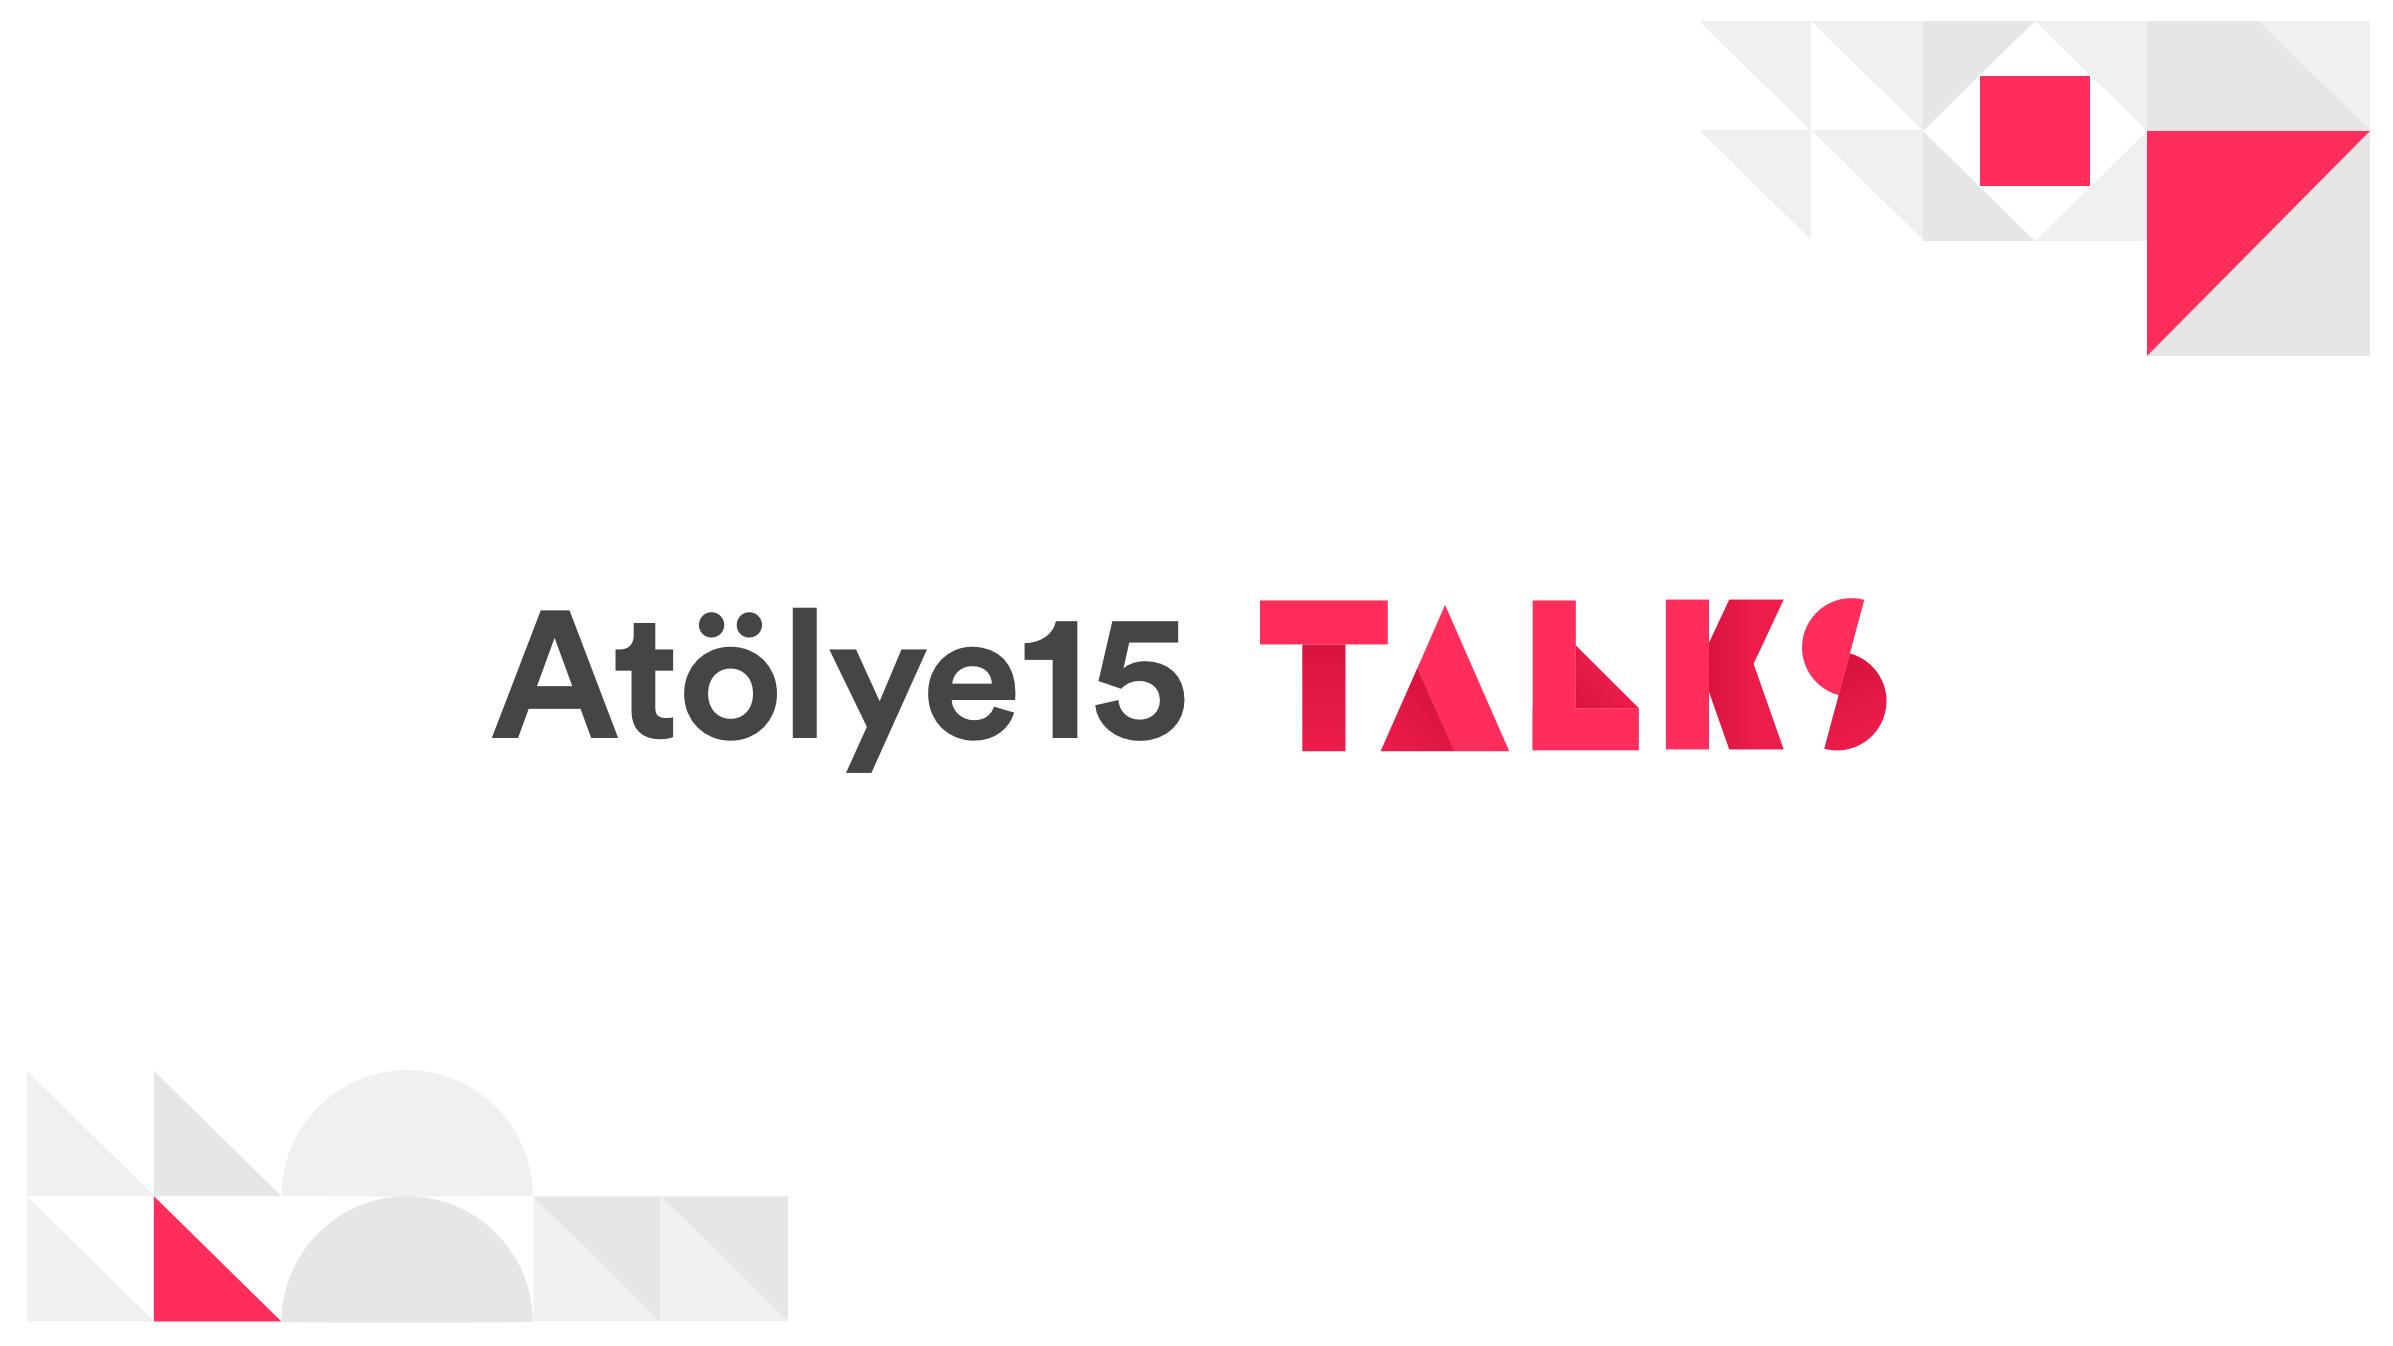 Atölye15 Talks